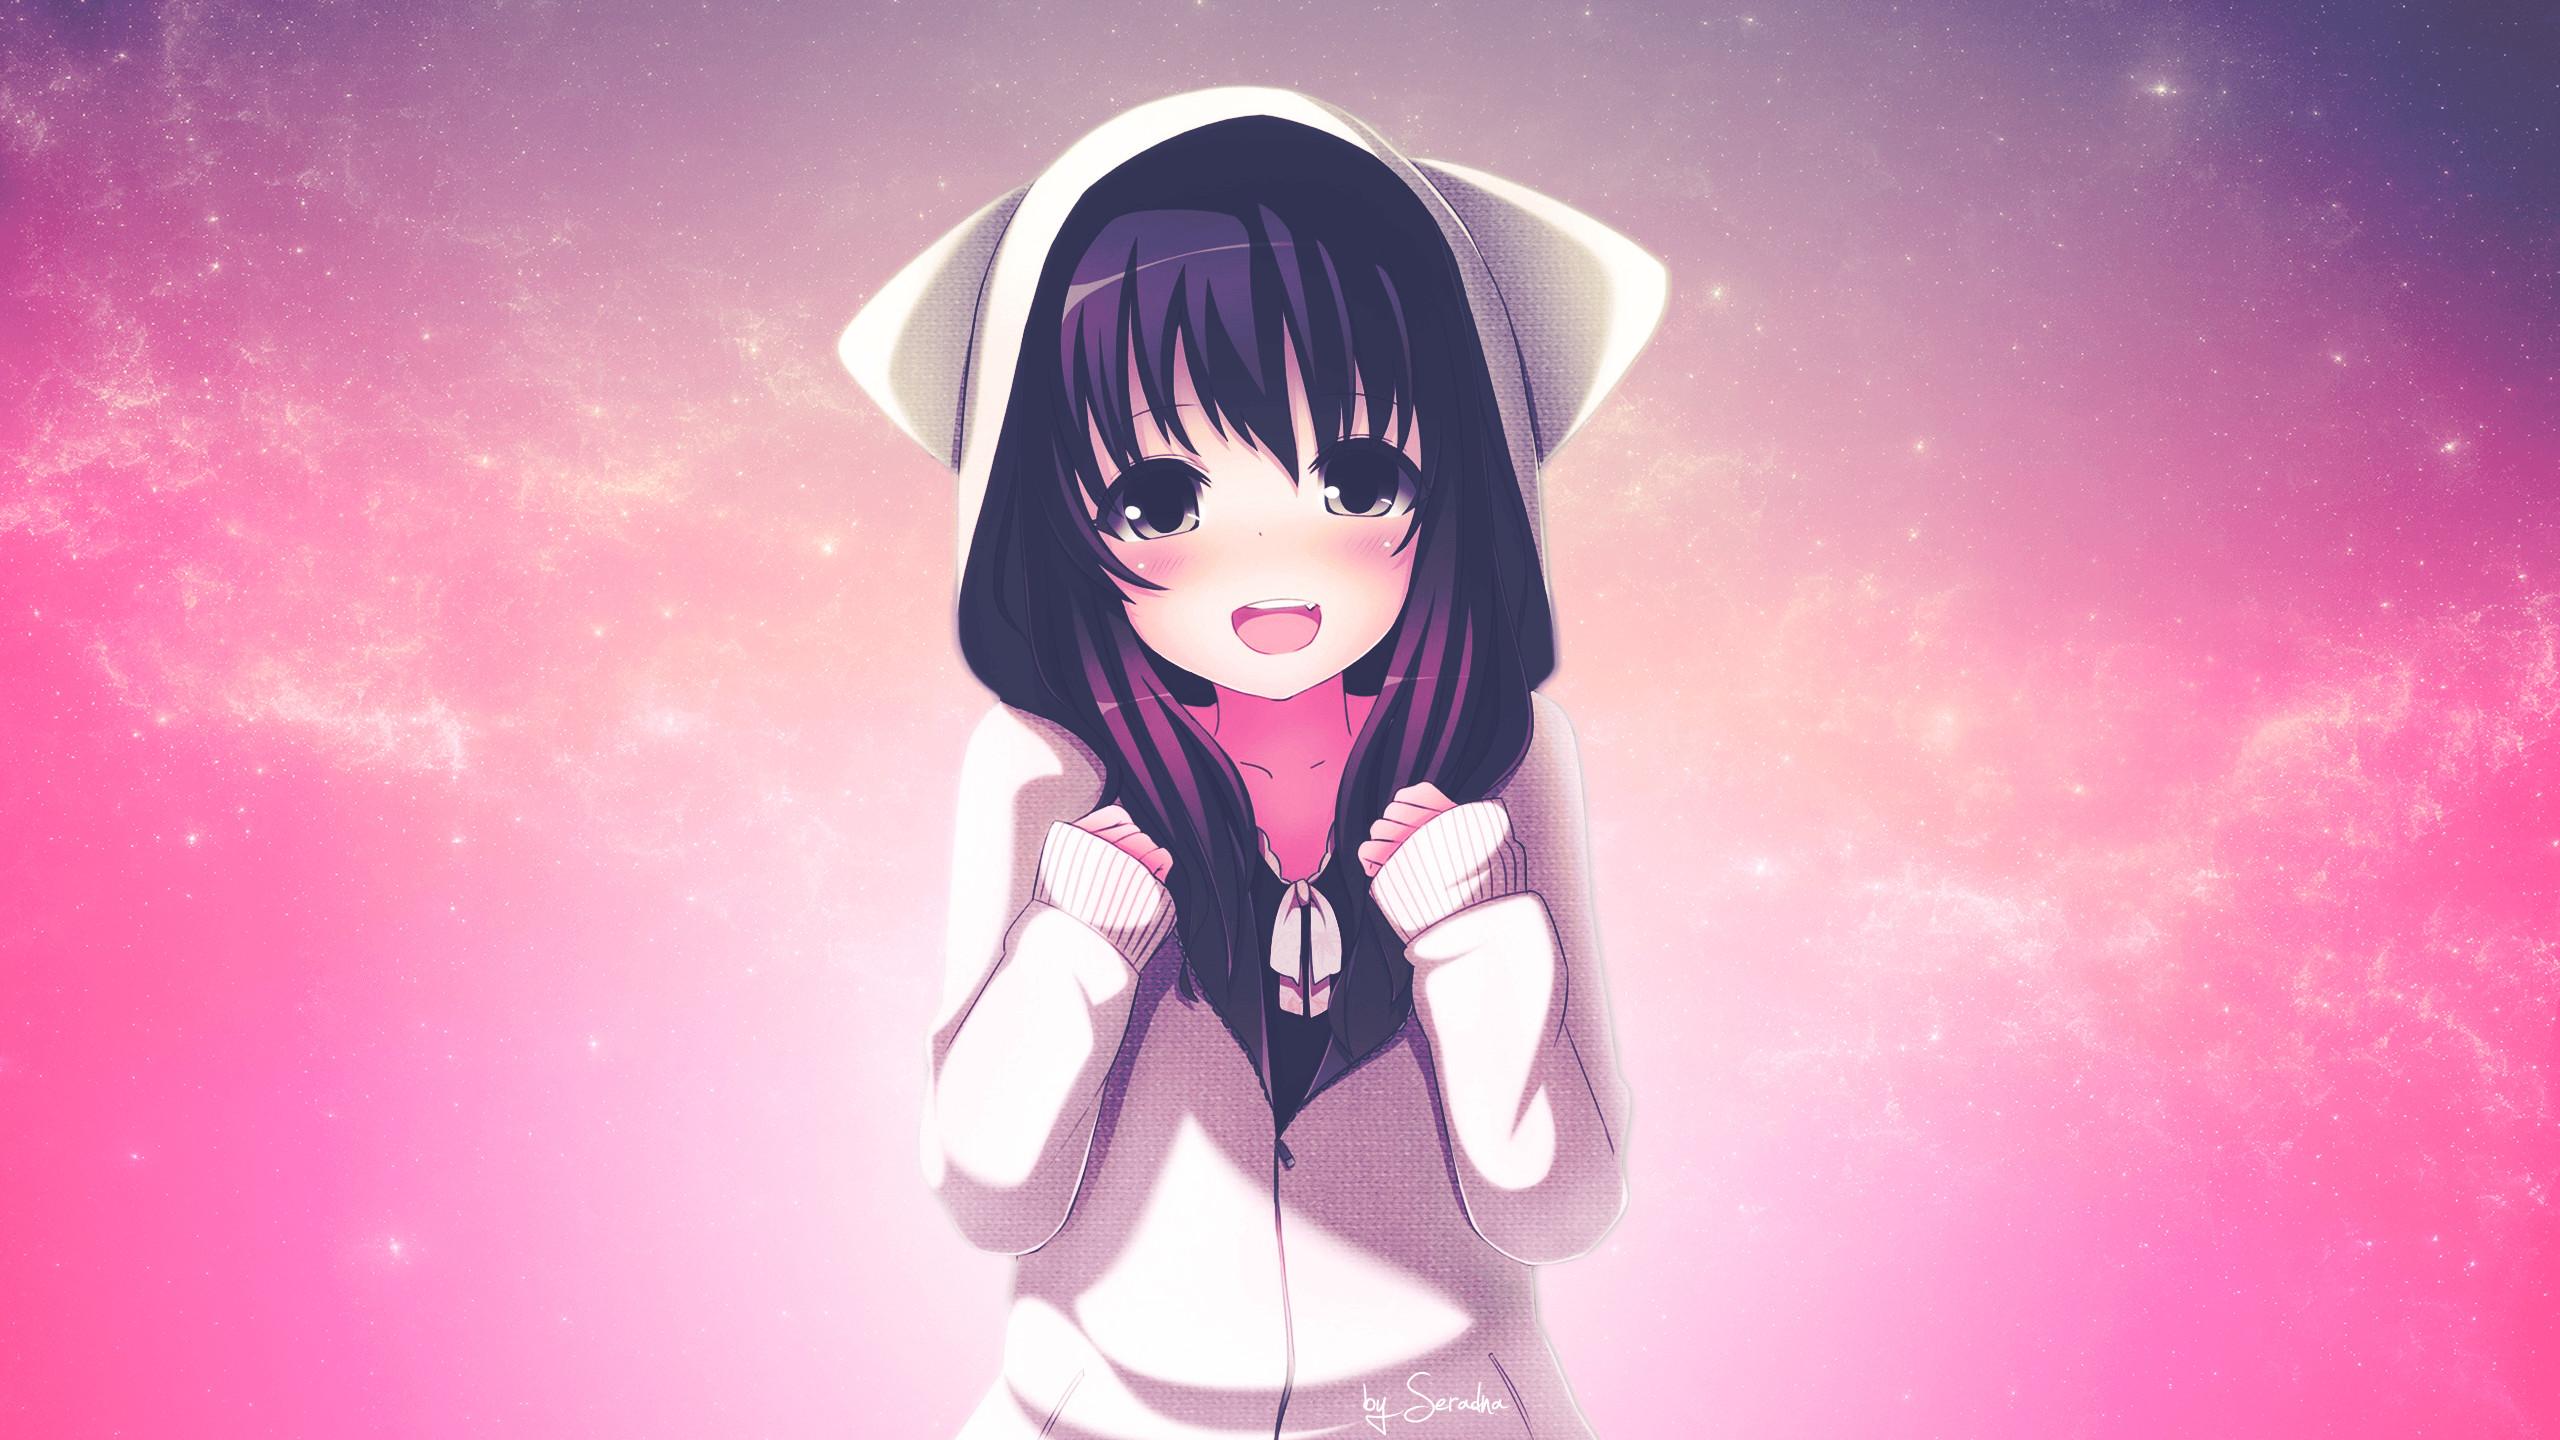 Cute Anime Girls Hd Wallpaper 77 Images